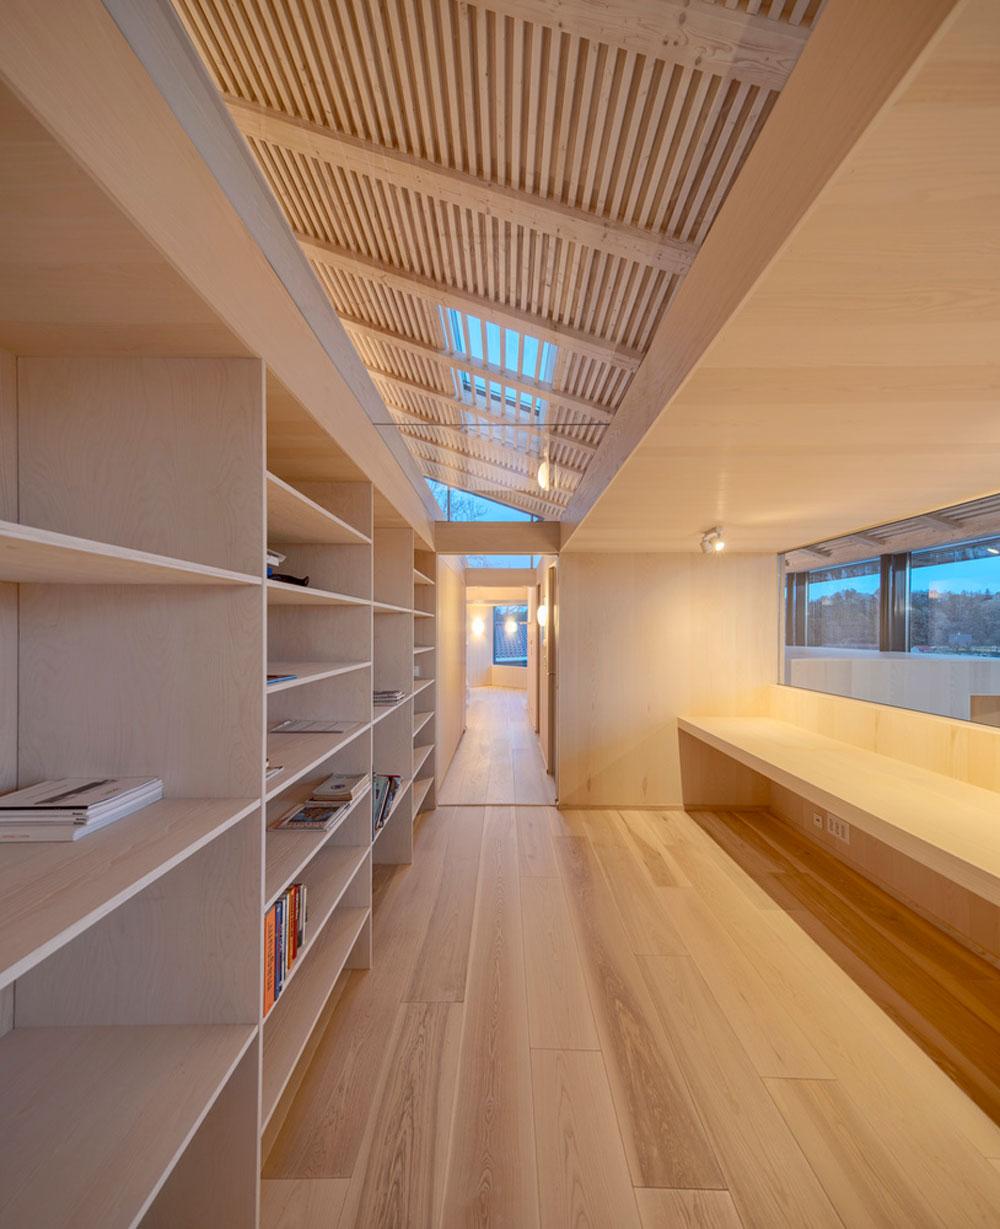 Reilstad-Summerhouse-_-Helen-&-Hard-Visual-Atelier-8-Architecture-7.jpg